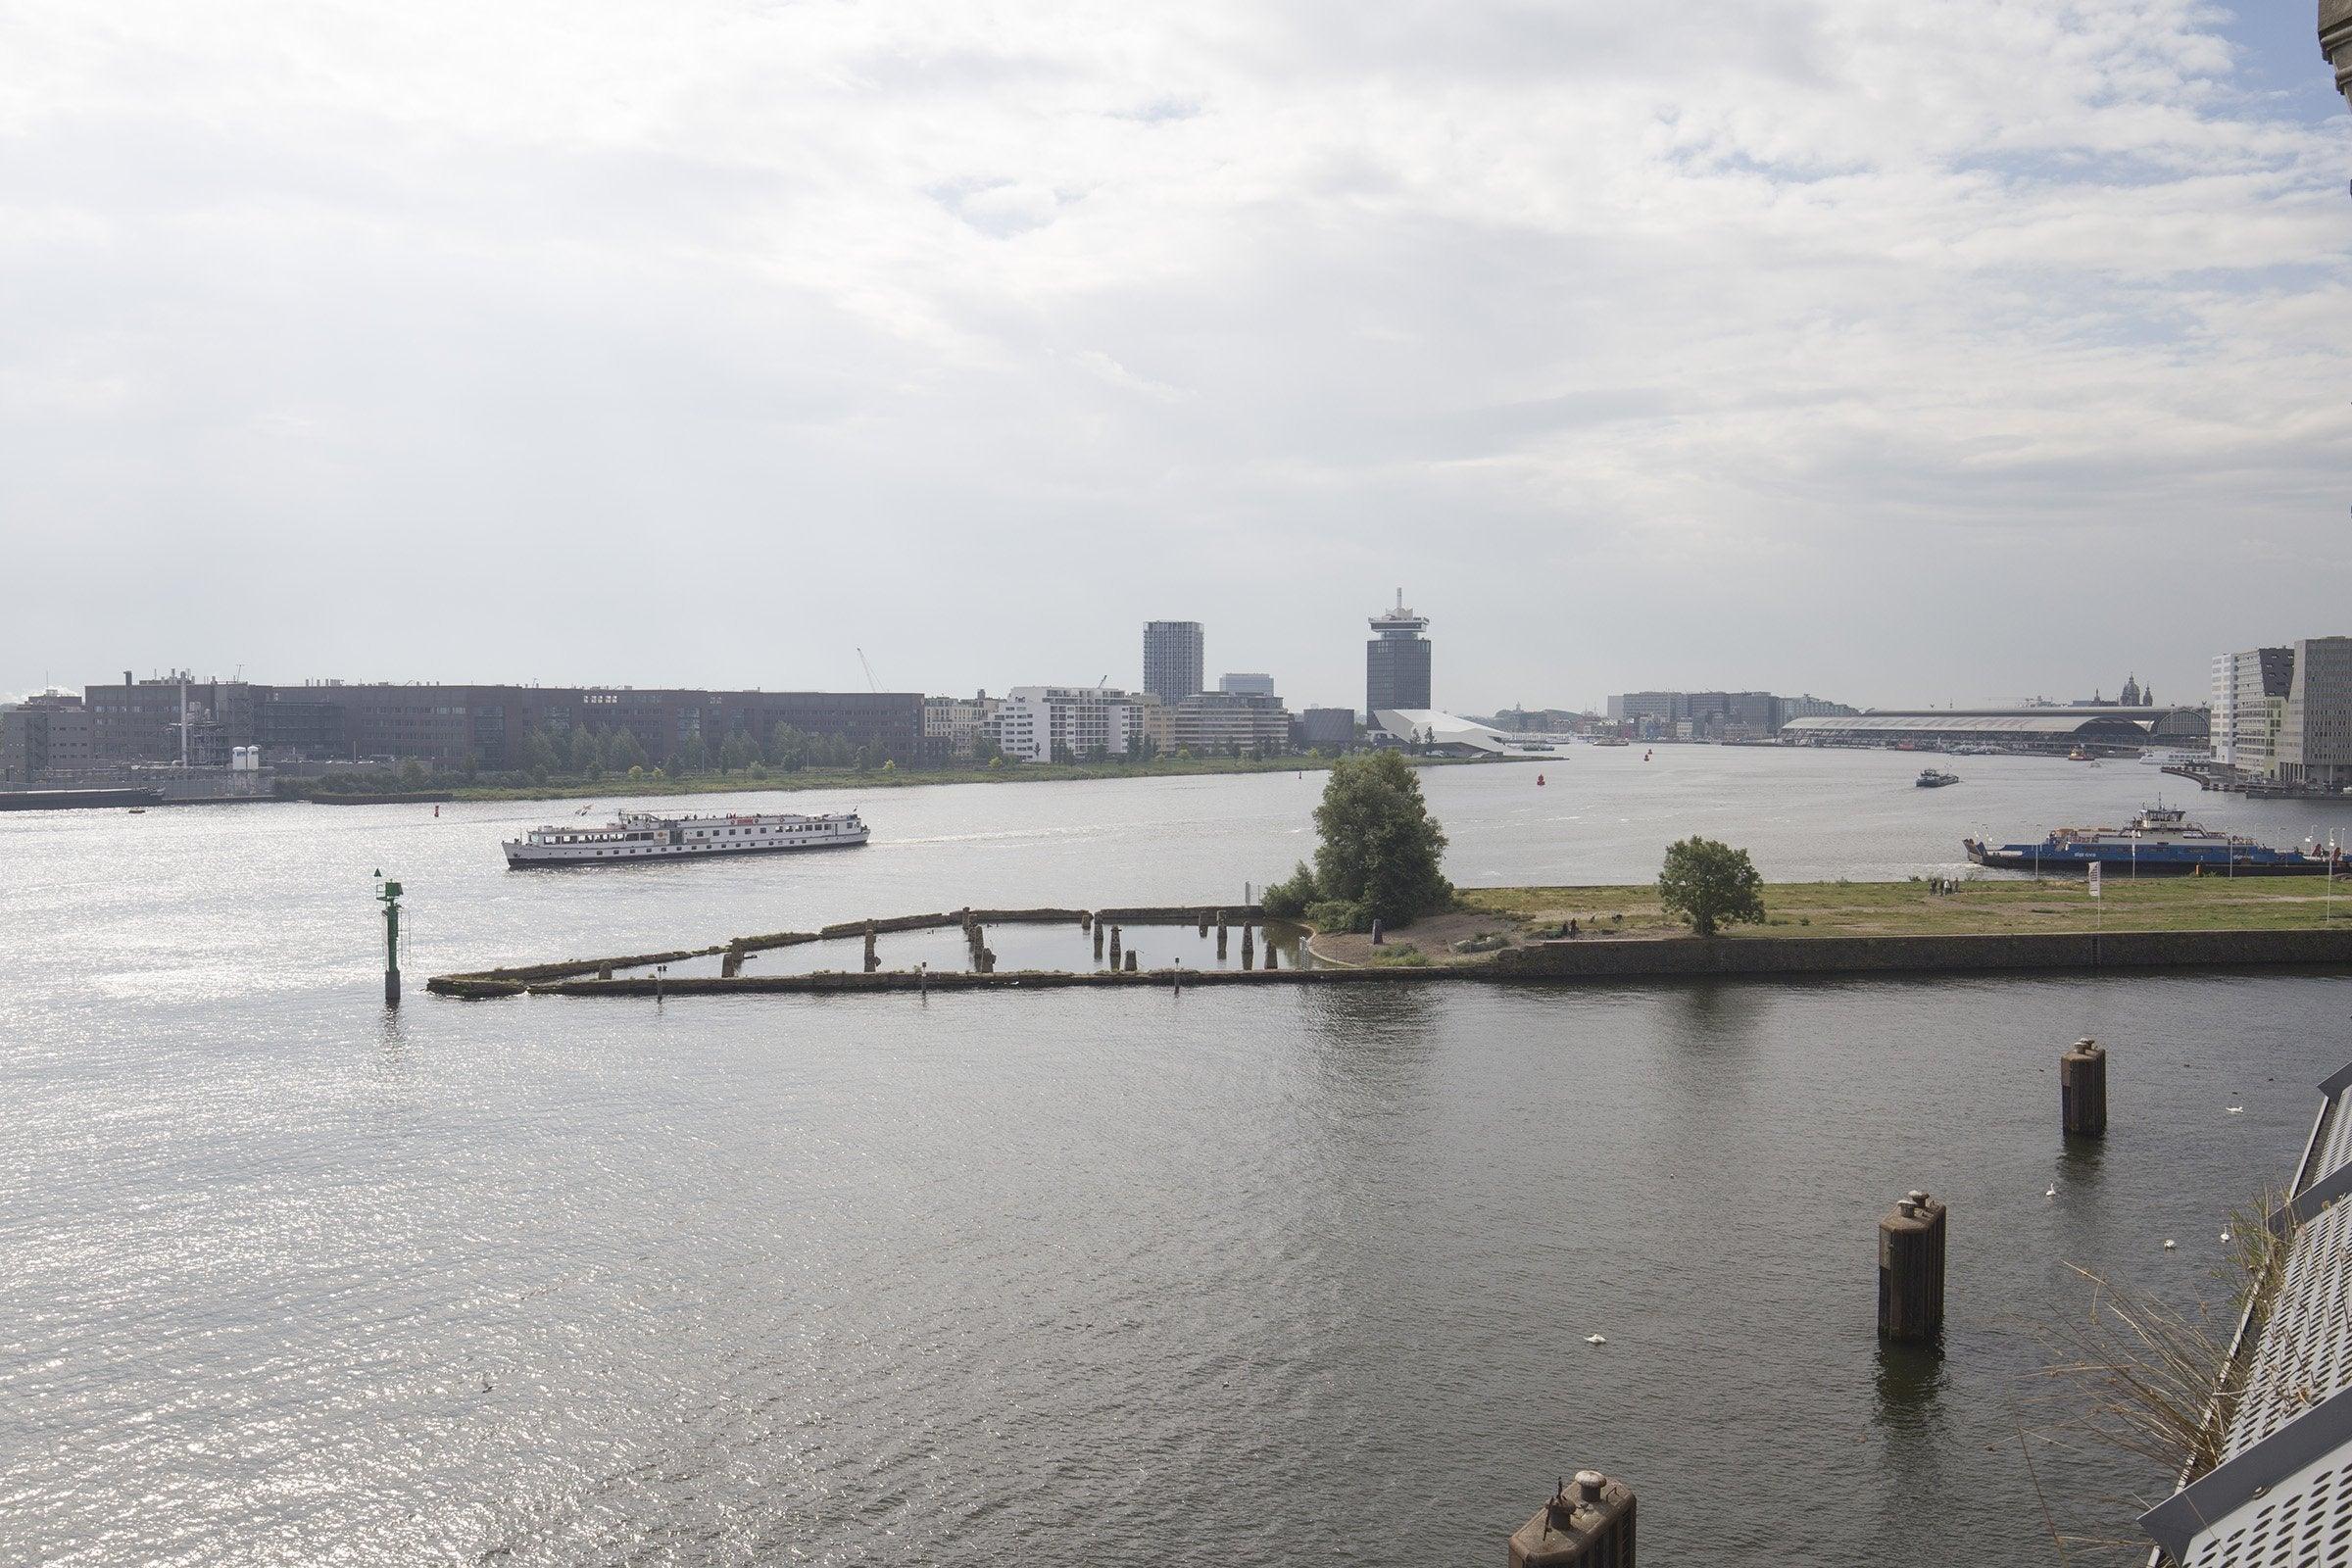 https://public.parariusoffice.nl/15/photos/huge/51292607.1500297978-689.jpg